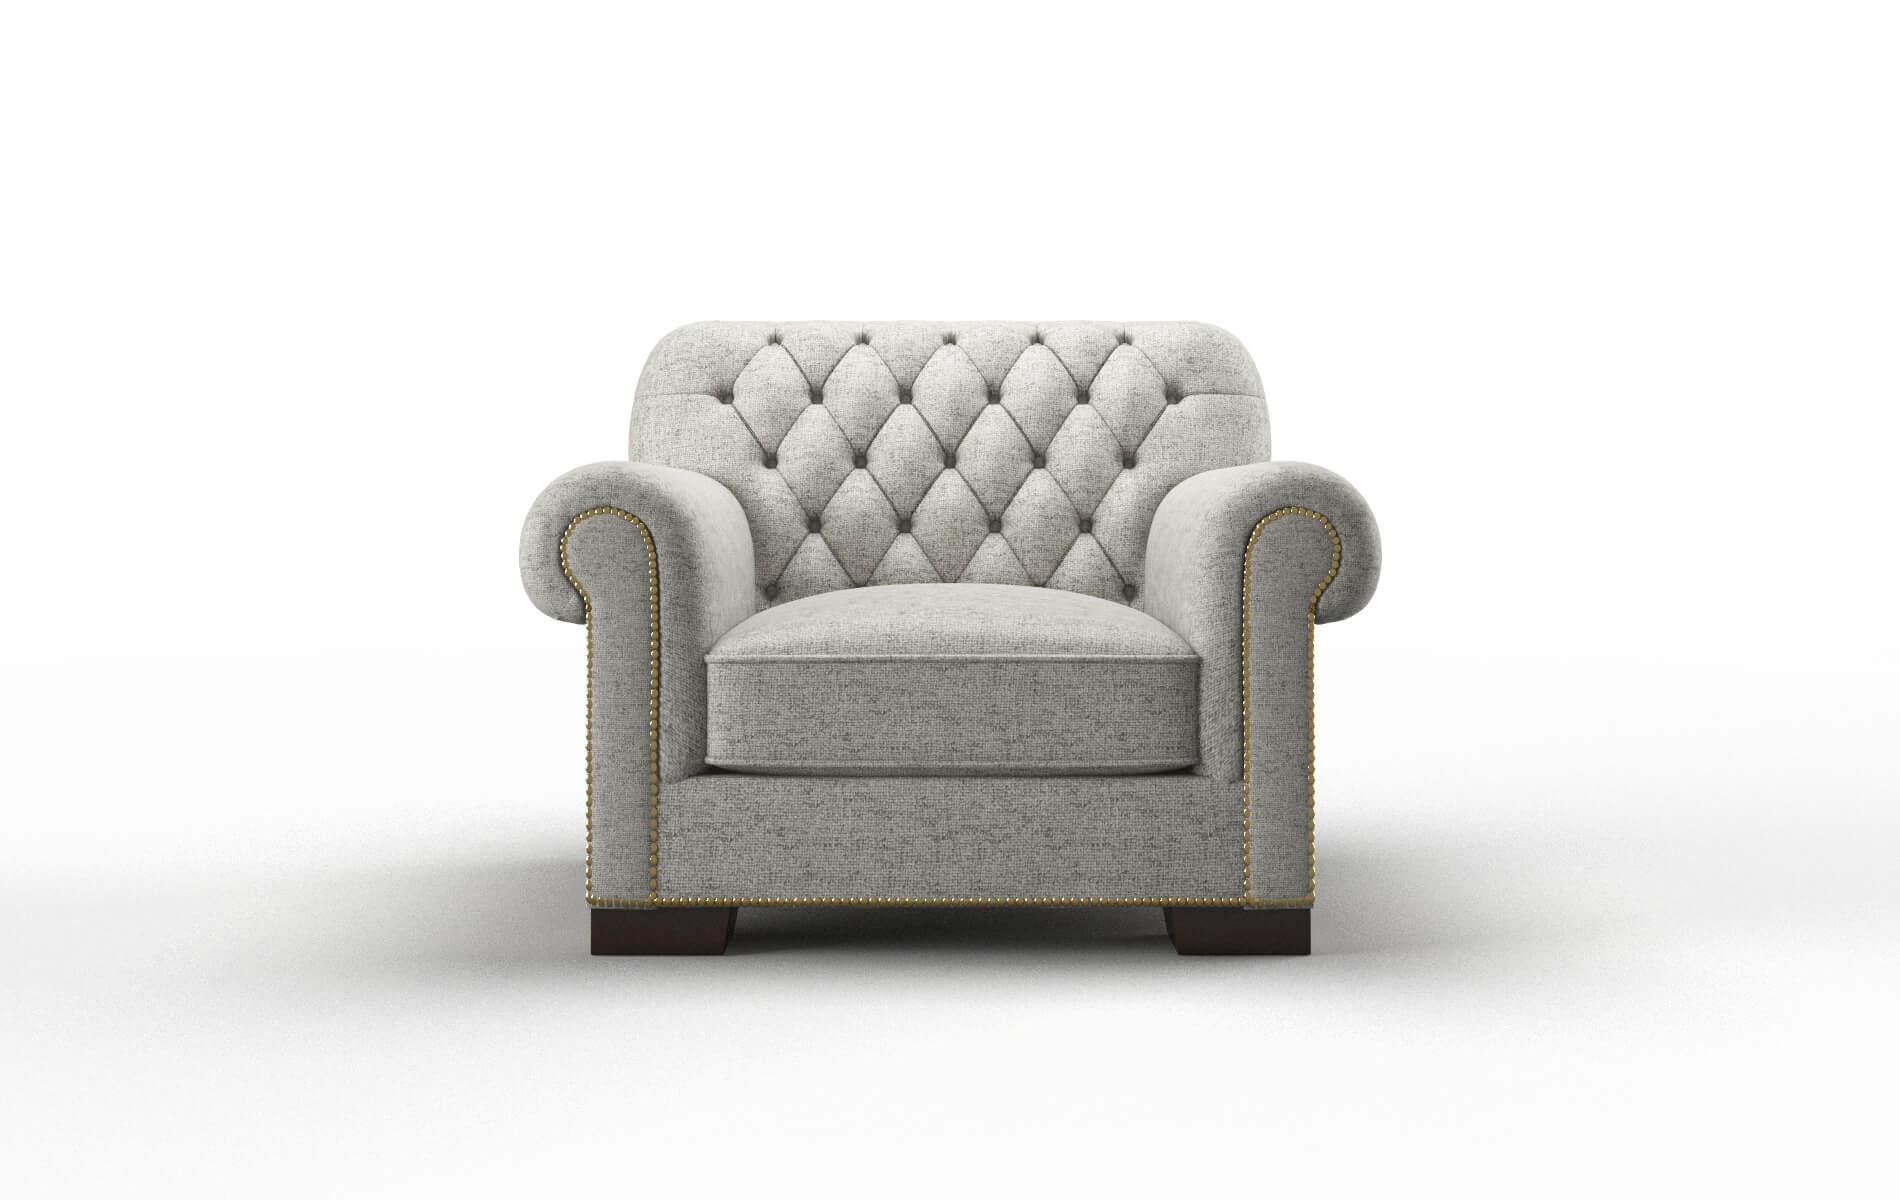 Chester Oceanside Granite Chair espresso legs 1